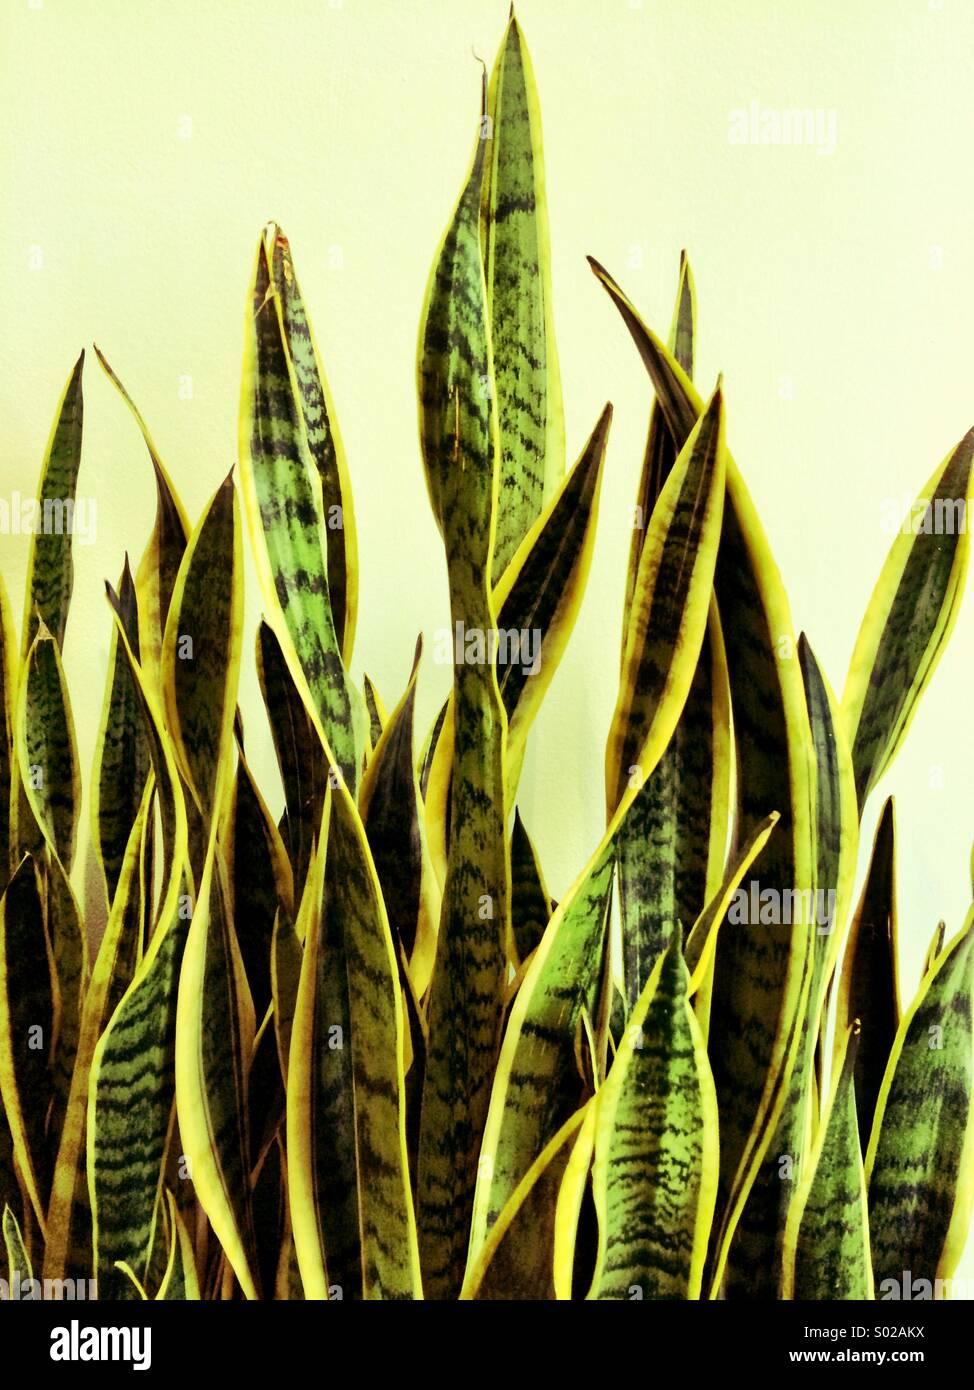 Indoor plant - Stock Image